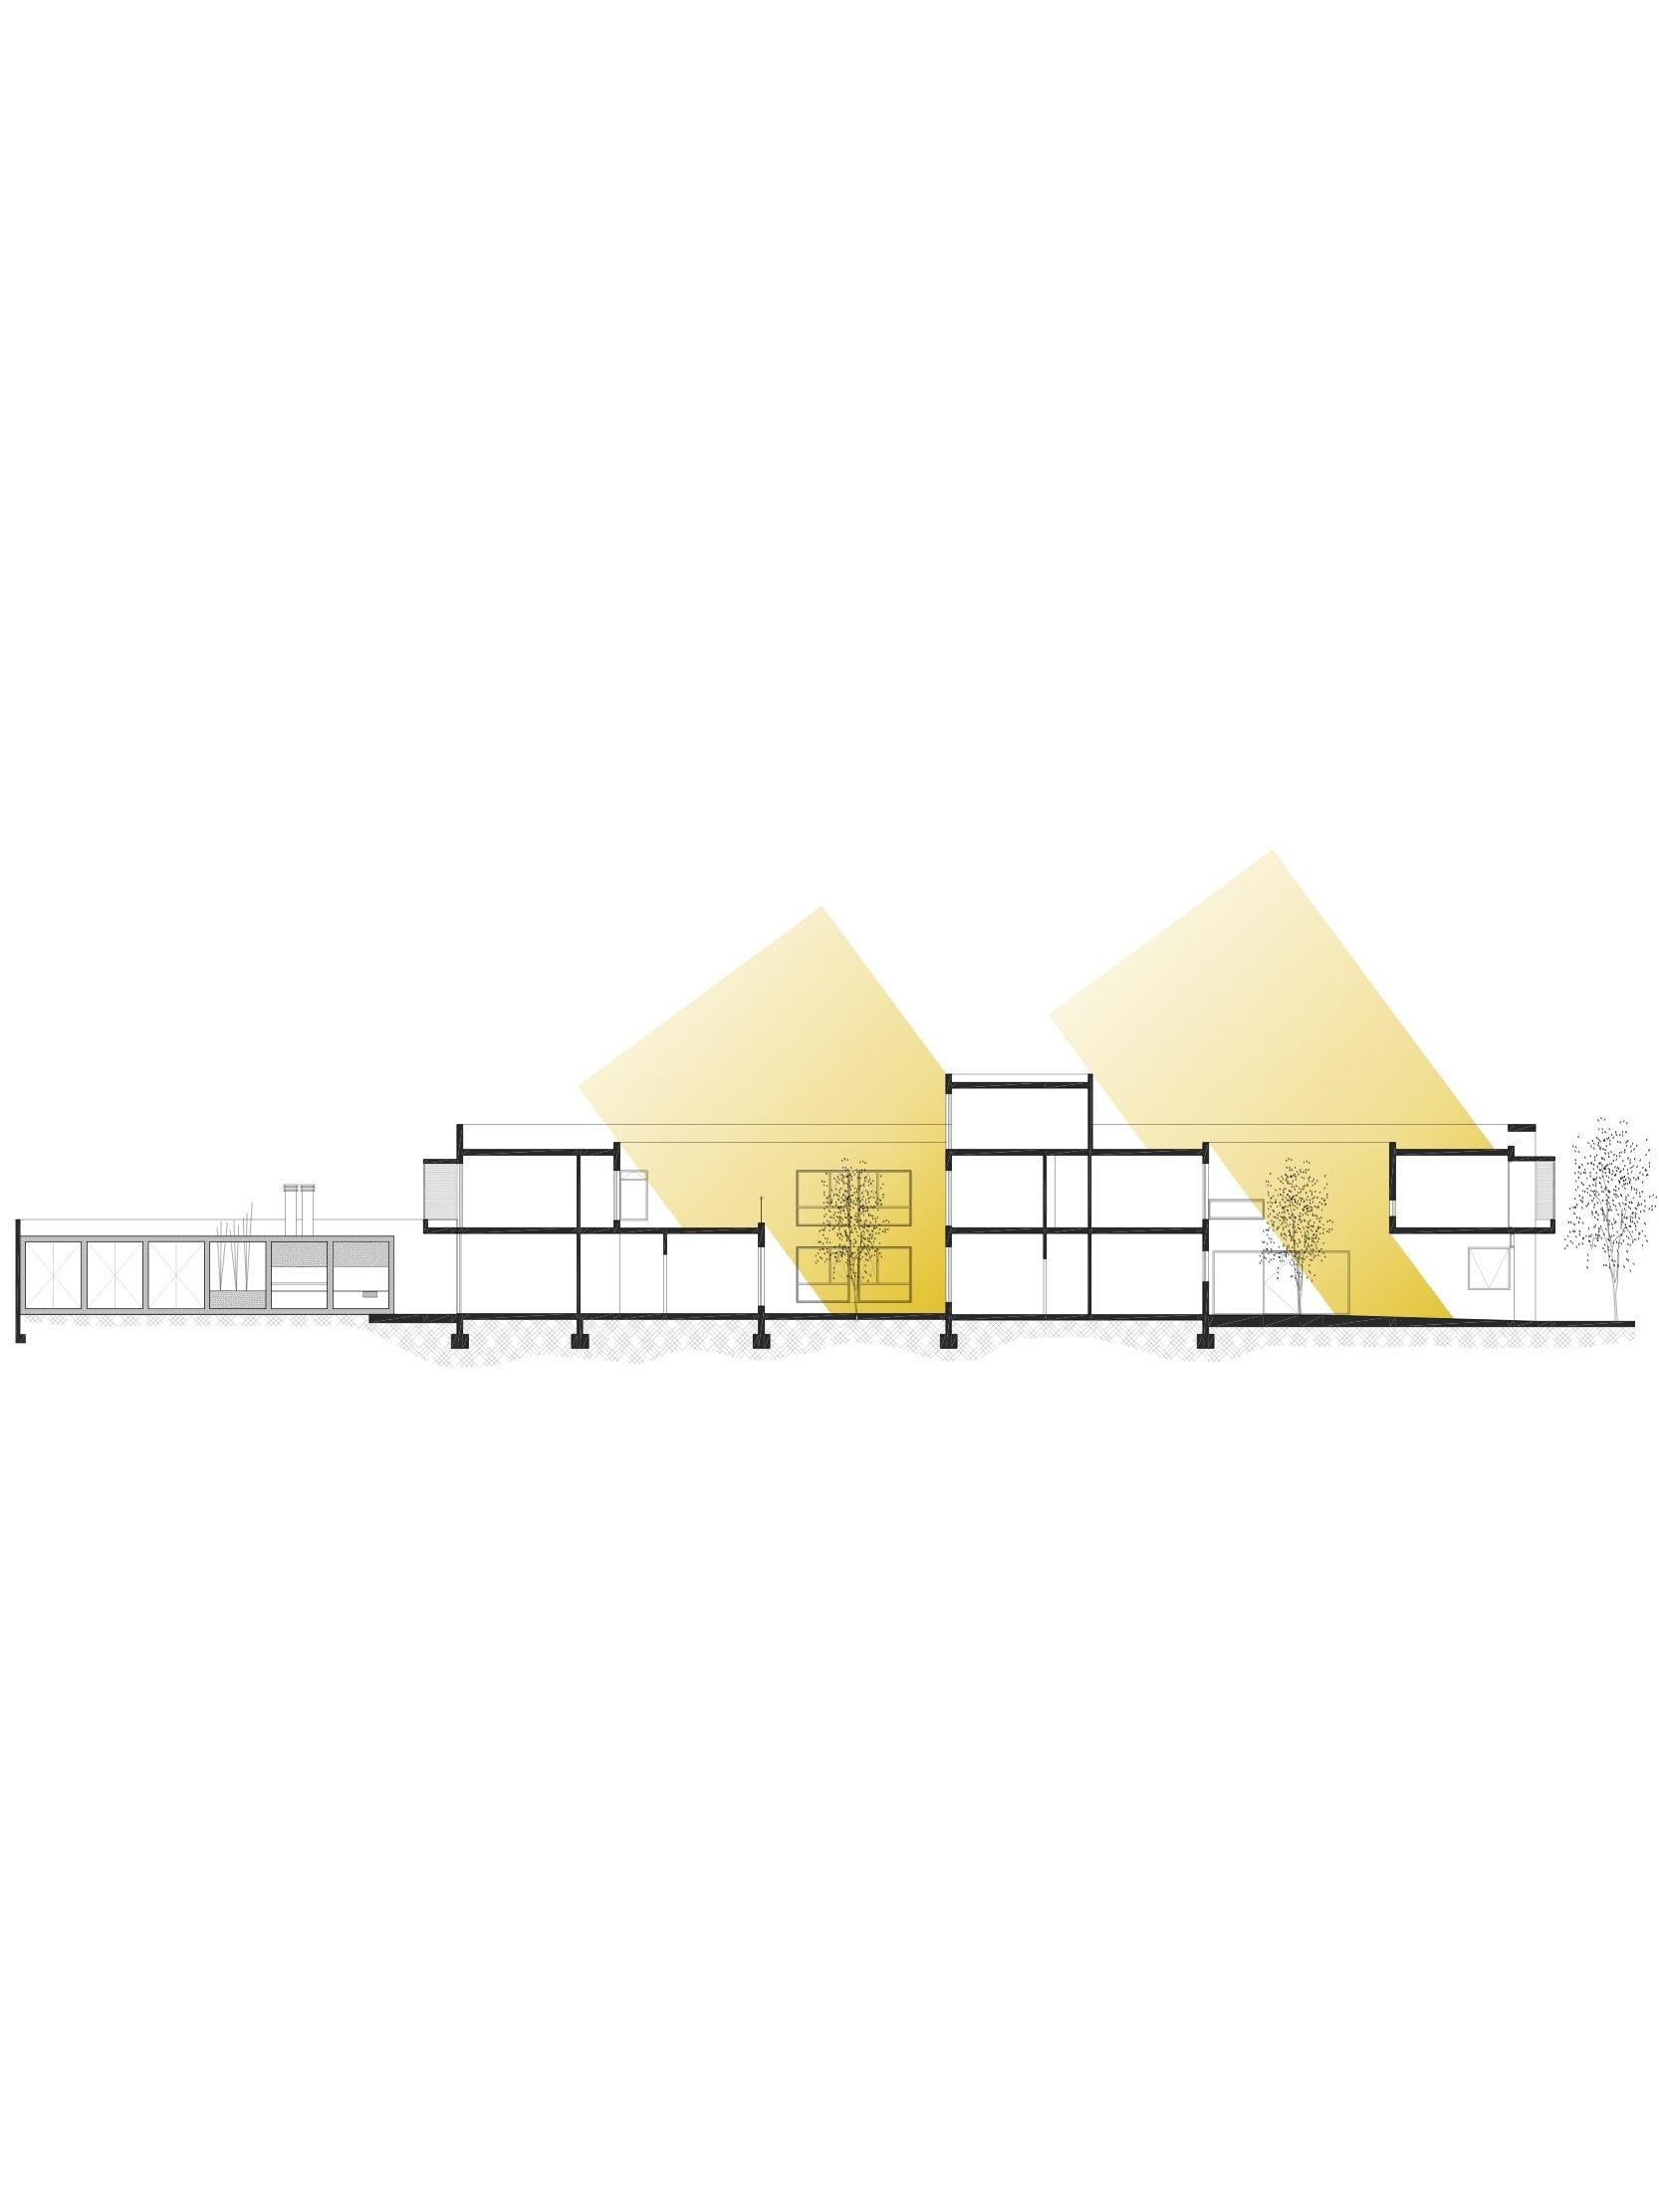 Casa Comunidad - Matías Aguado, arquitectura, casas